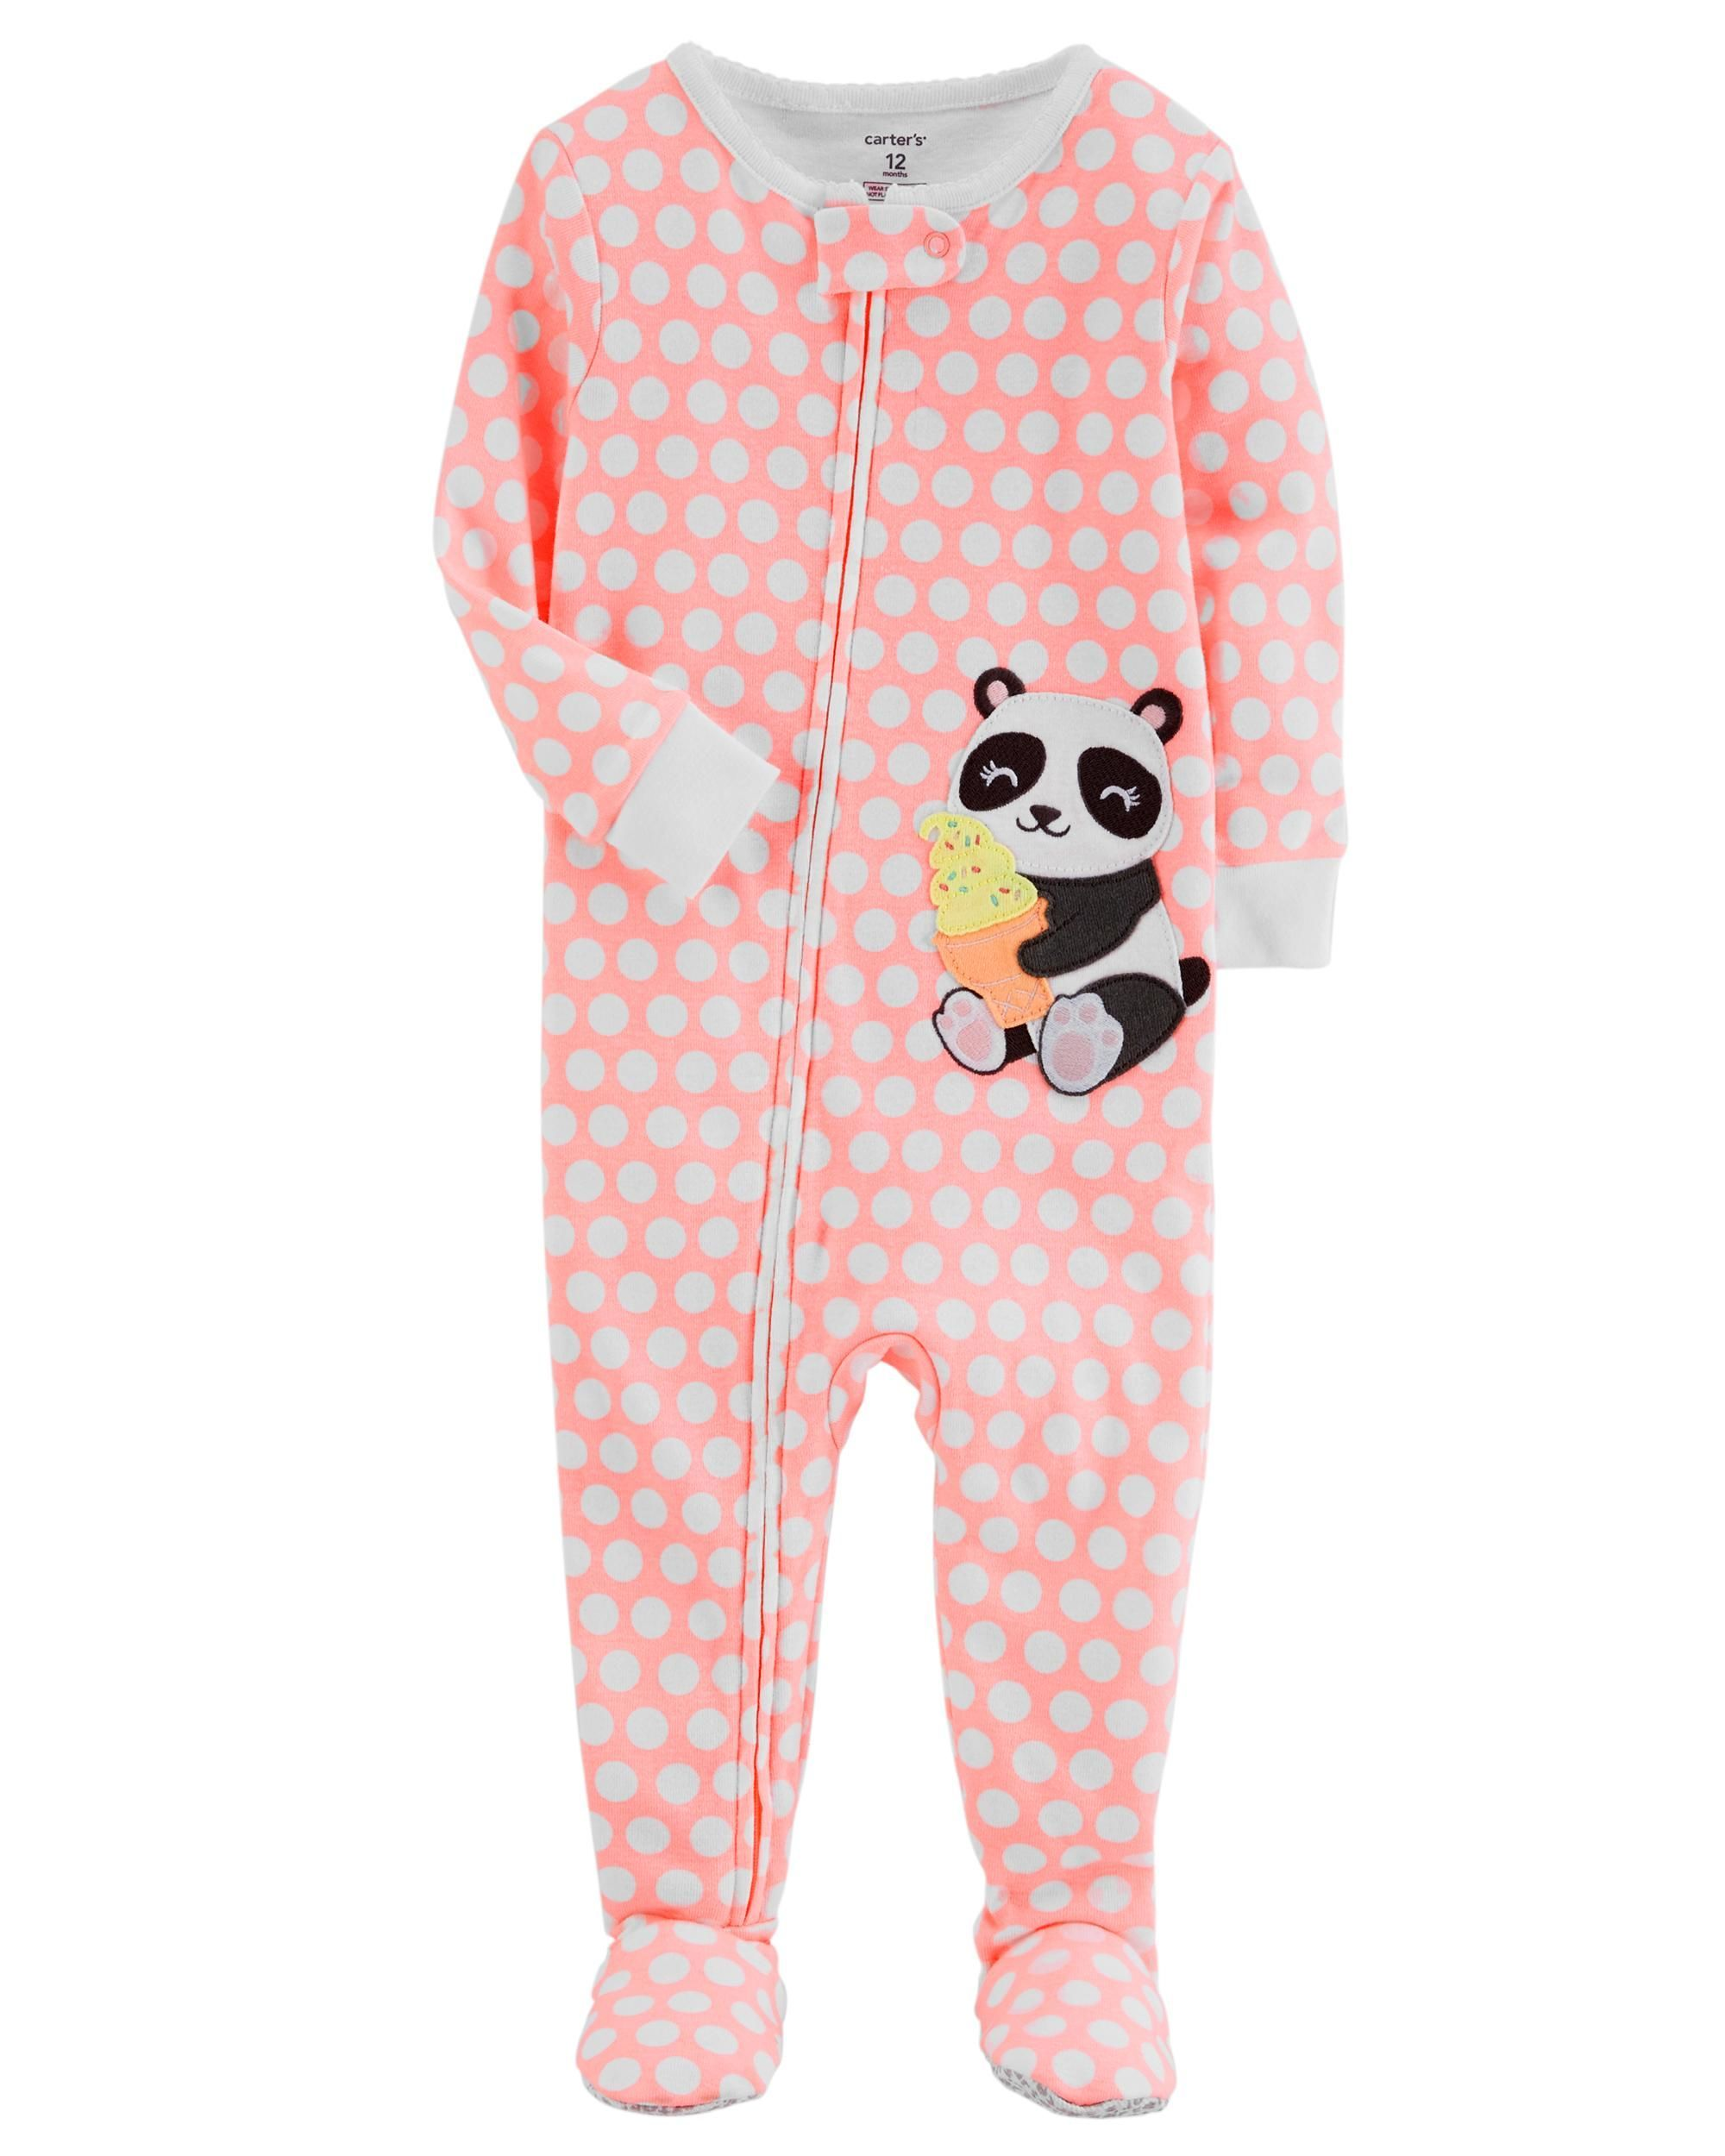 44e7fb9ea93b 1-Piece Neon Panda Snug Fit Cotton PJs